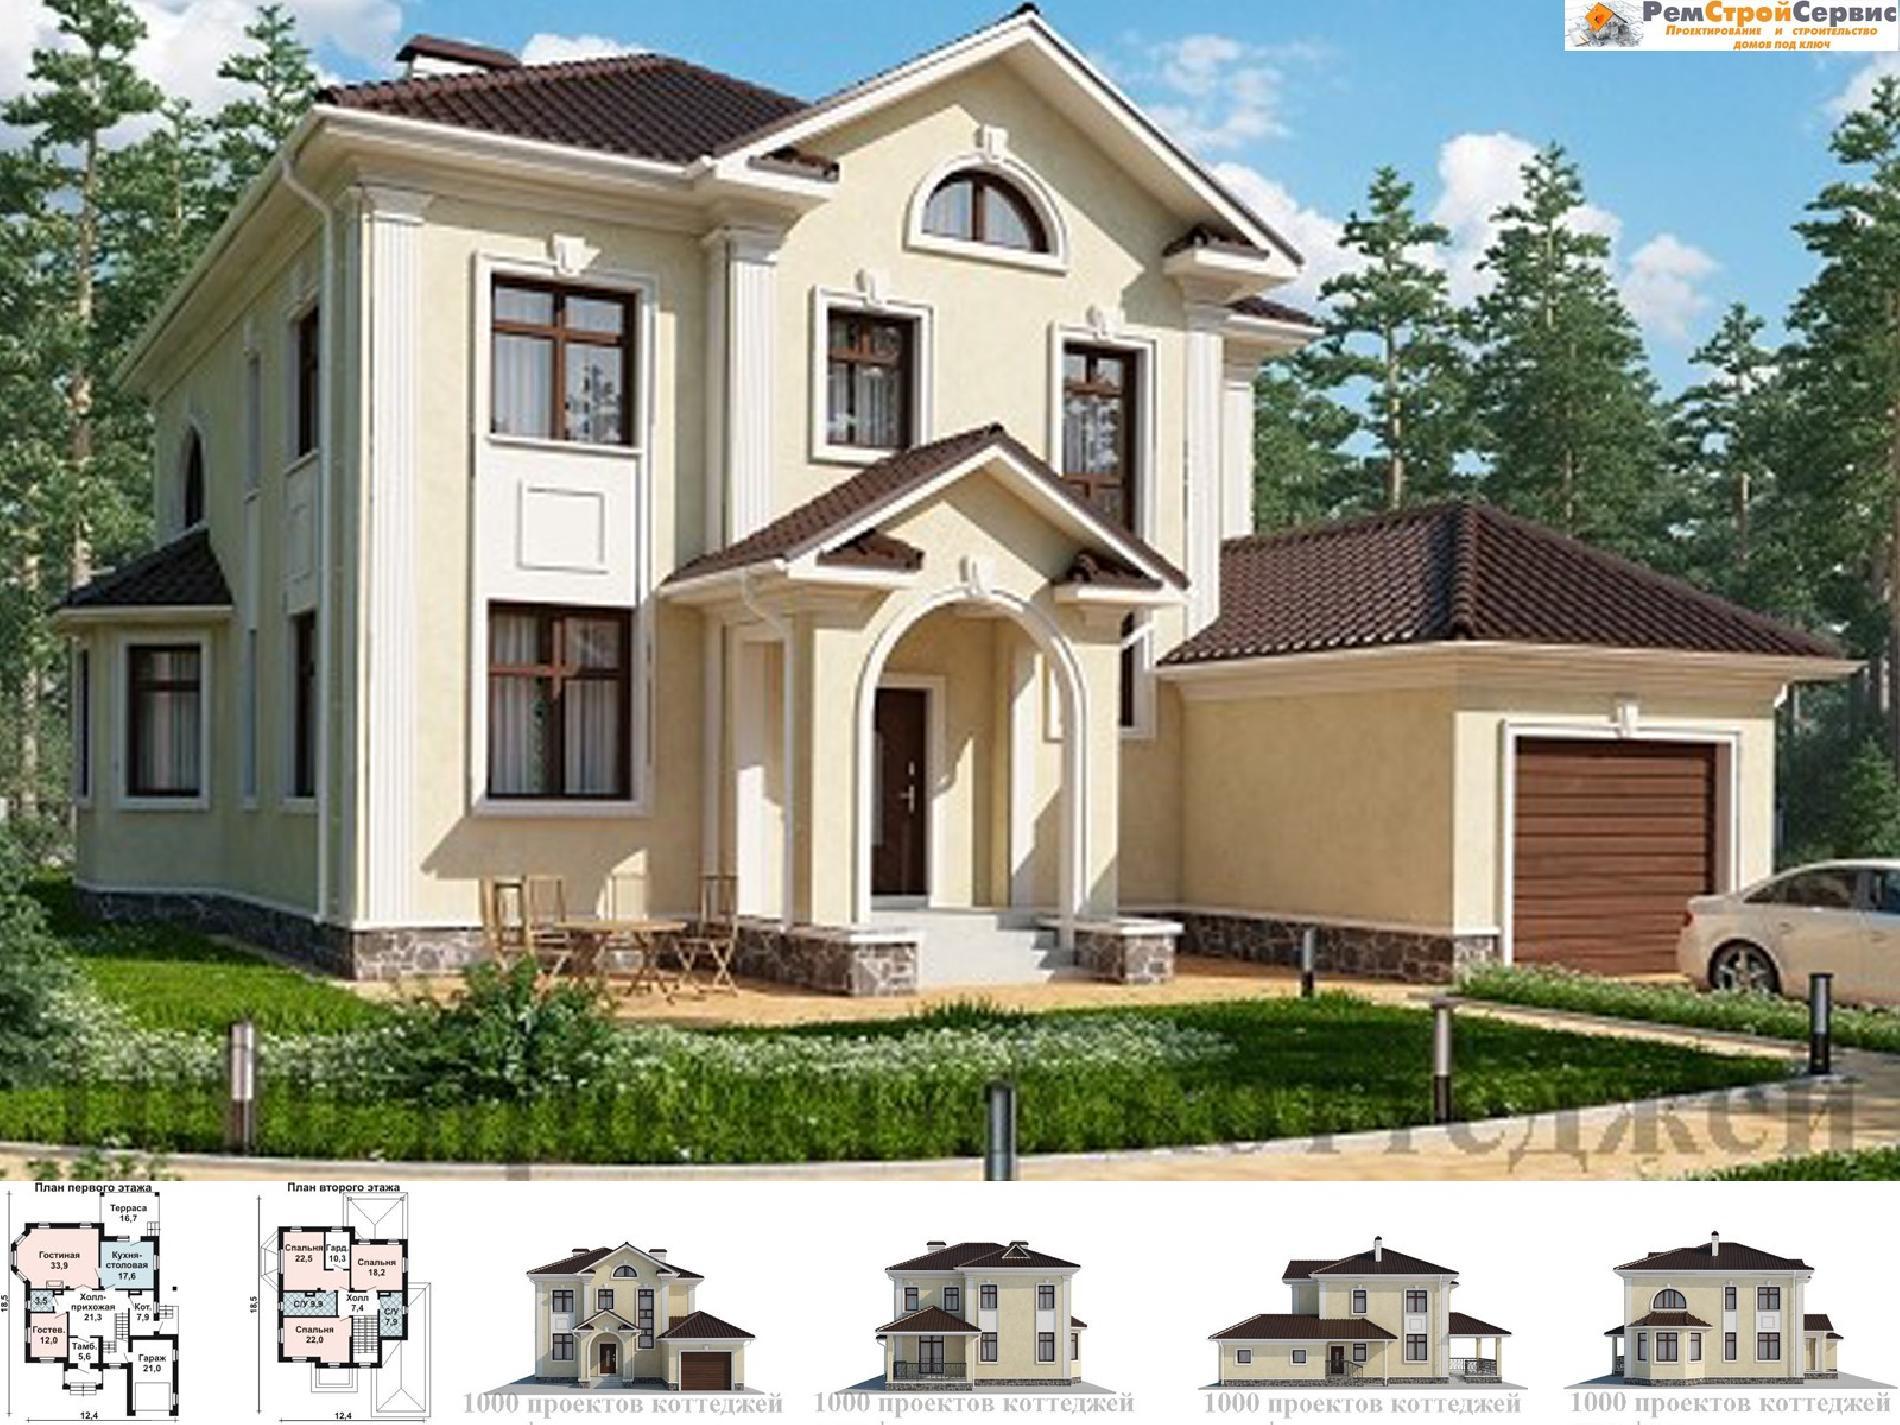 Проект дома №as-1383 proect_as-1383.jpg